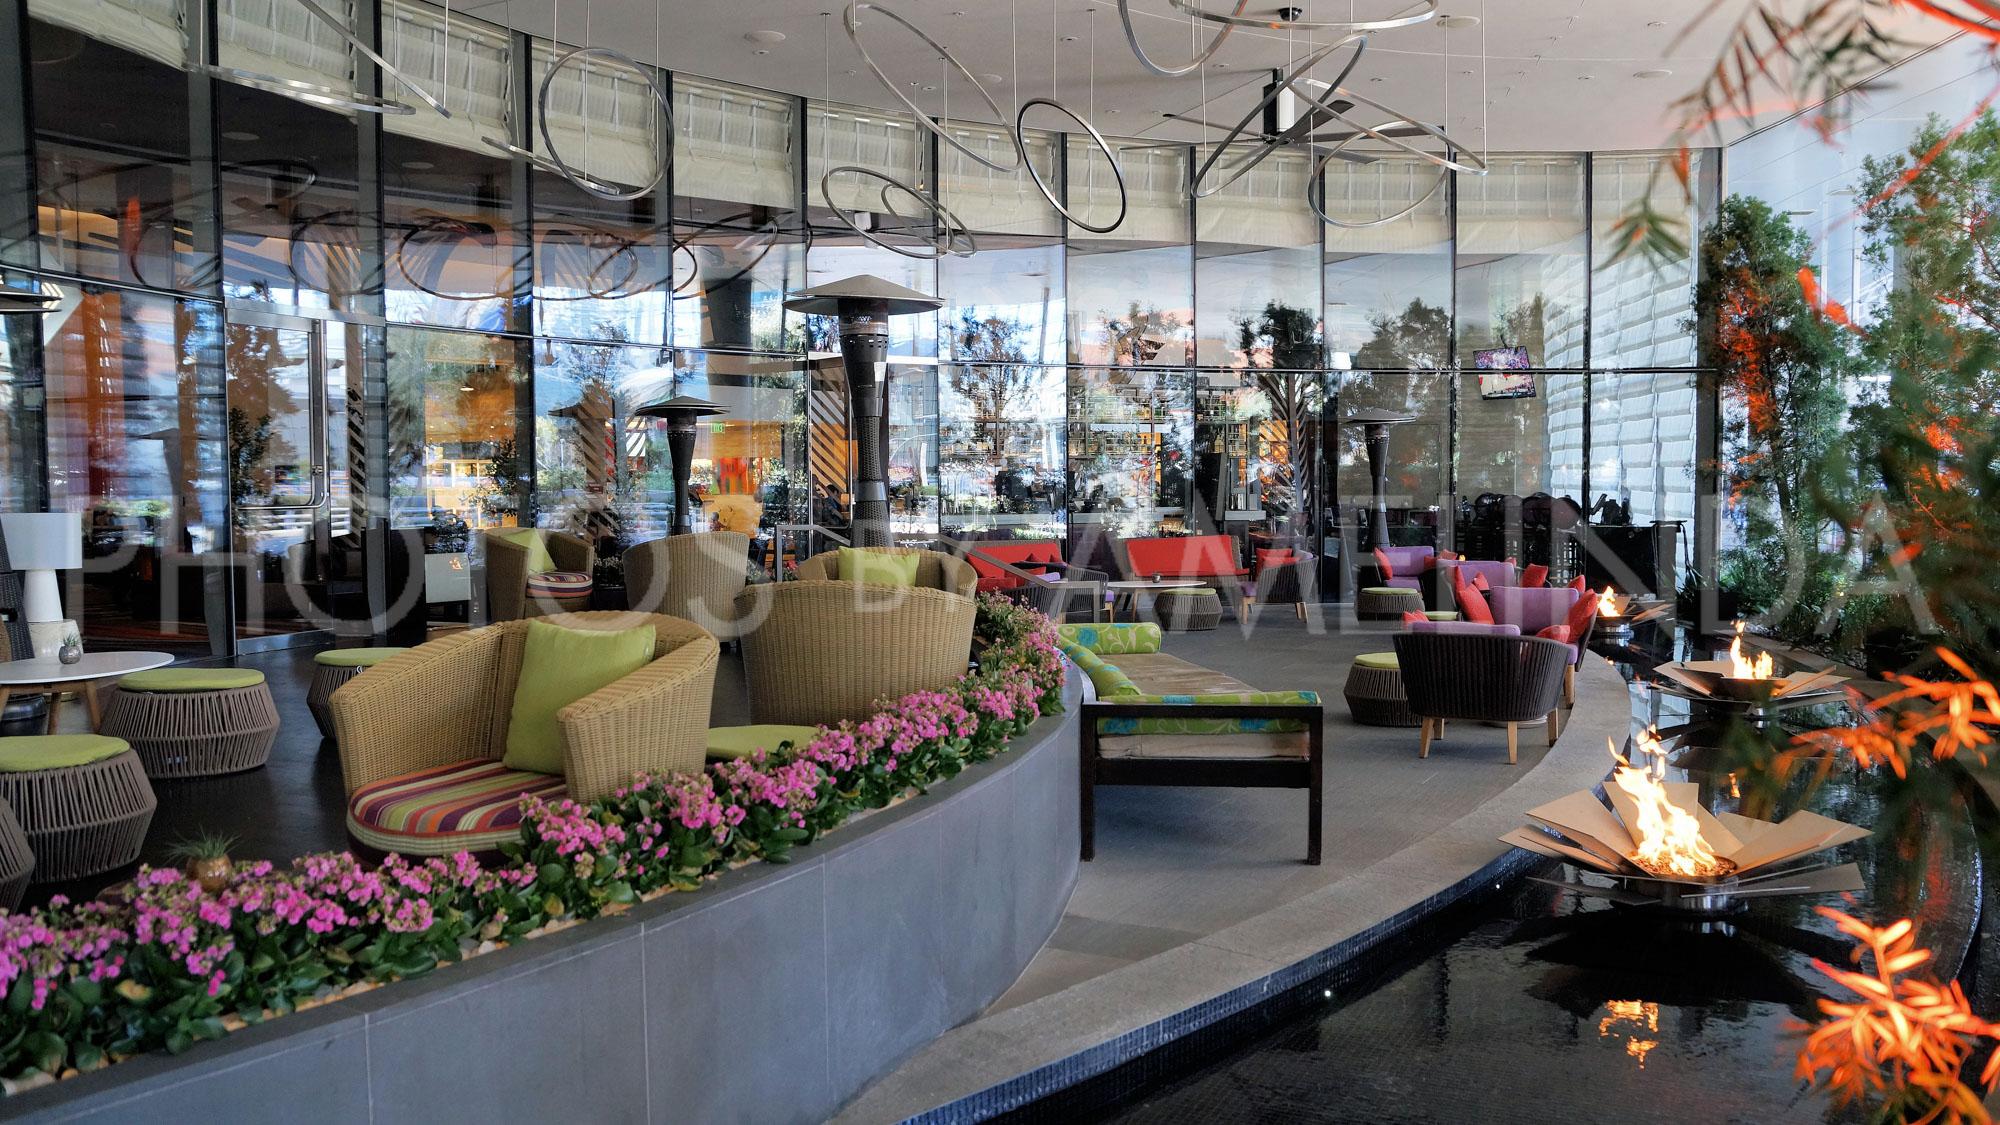 Vice Versa Patio & Lounge